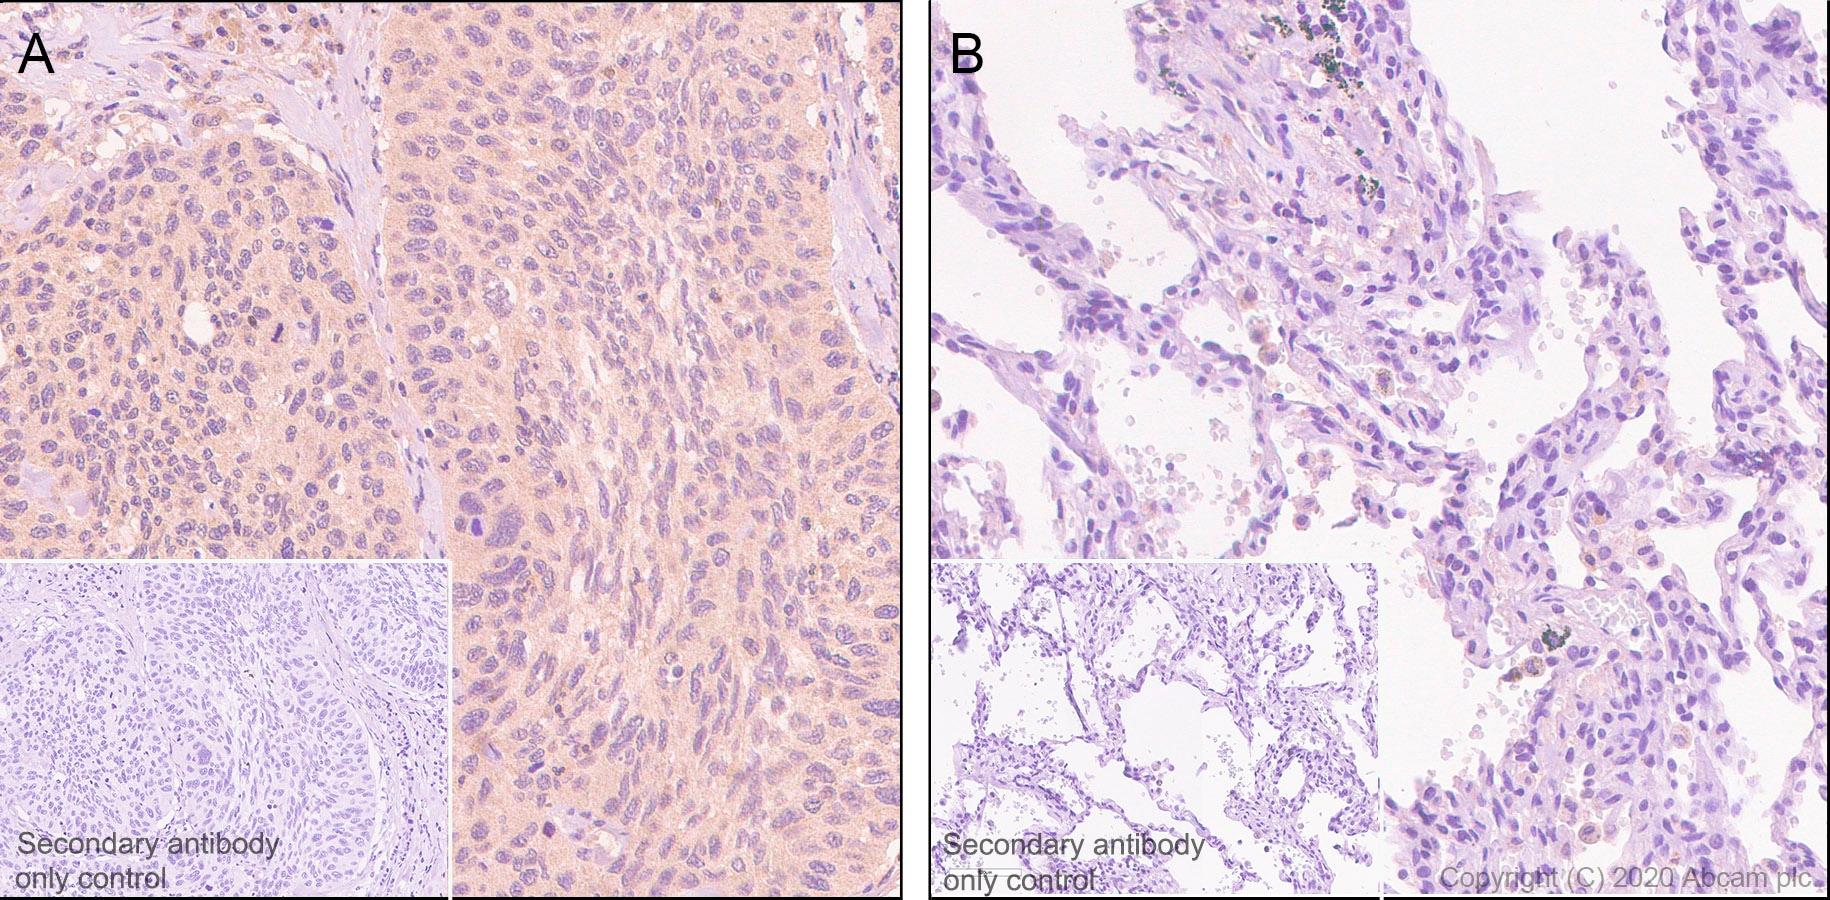 Immunohistochemistry (Formalin/PFA-fixed paraffin-embedded sections) - Anti-Aldolase antibody [EPR23181-39] - BSA and Azide free (ab273636)